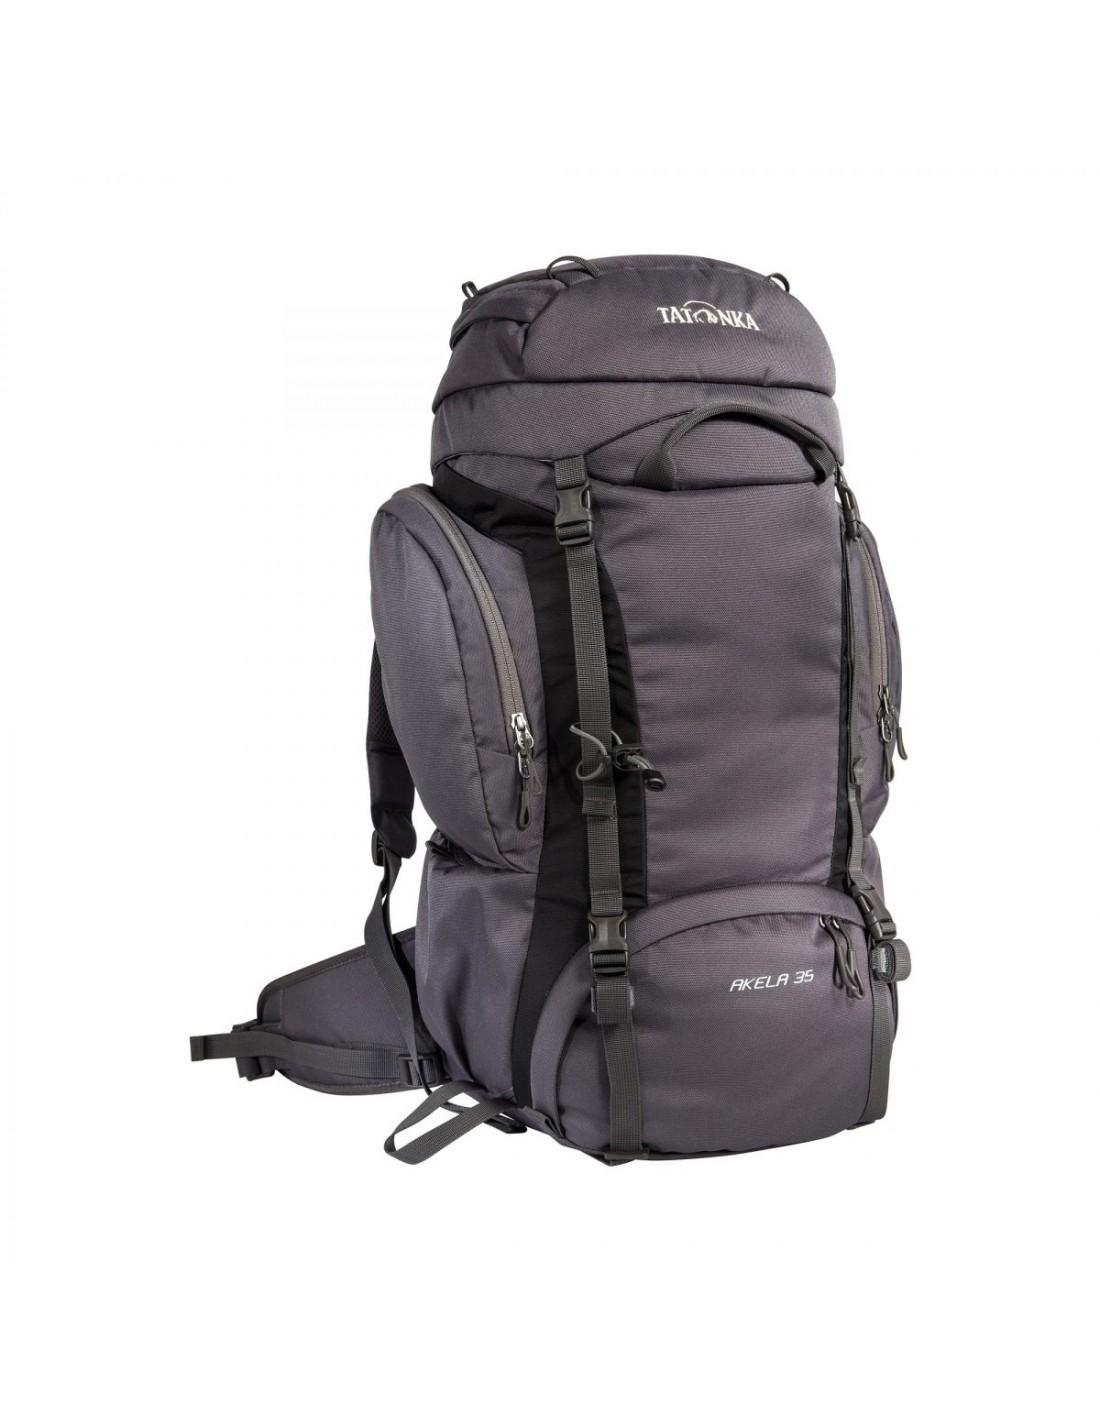 Tatonka Rucksack Akela 45, titan-grey Rucksackart - Wandern & Trekking, Ruc günstig online kaufen